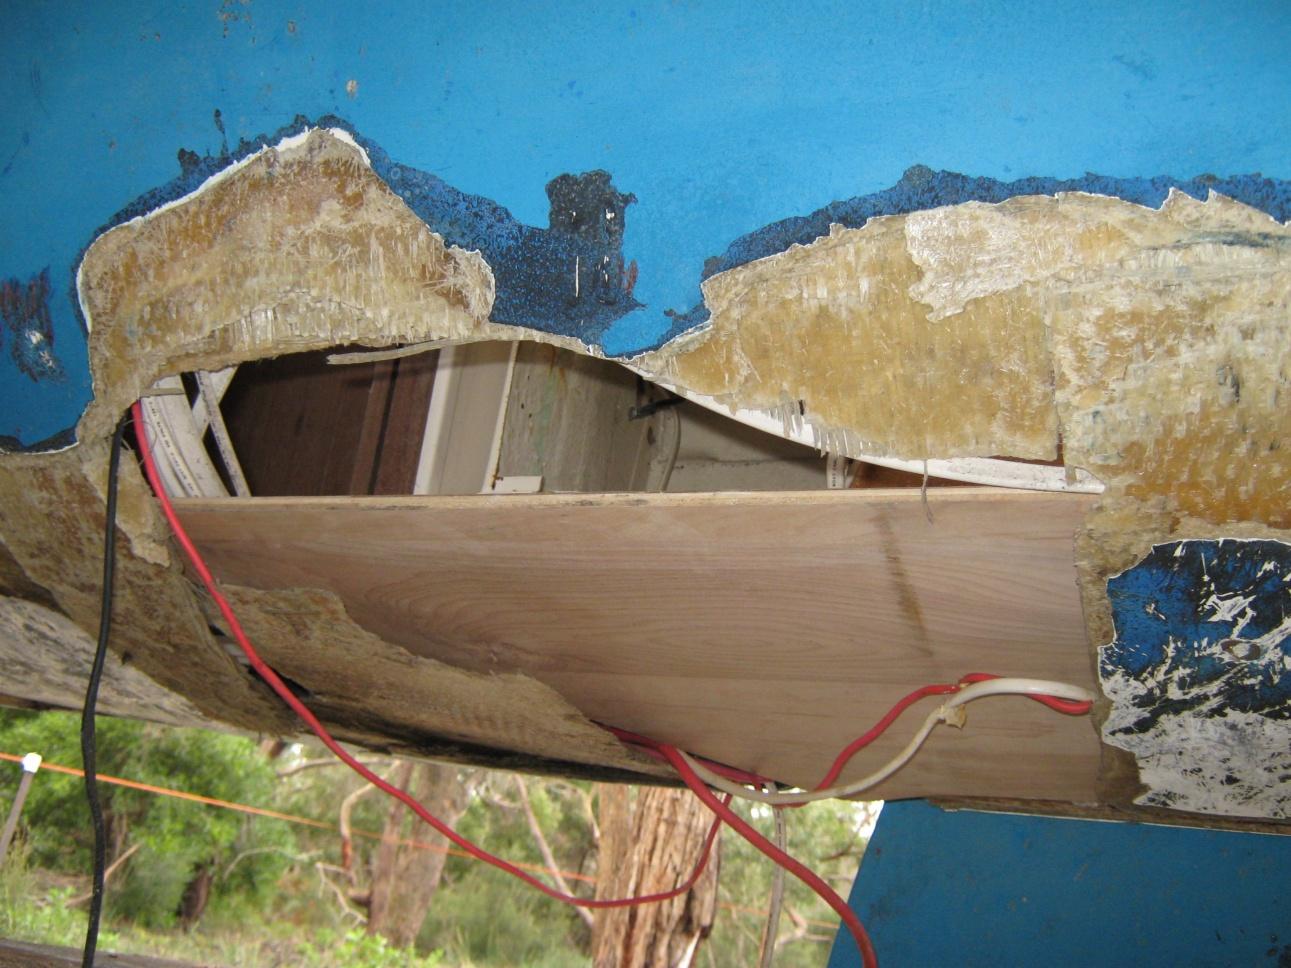 Click image for larger version  Name:Boat repairs in progress at Yaringa. June 2012 001.jpg Views:172 Size:427.8 KB ID:42439